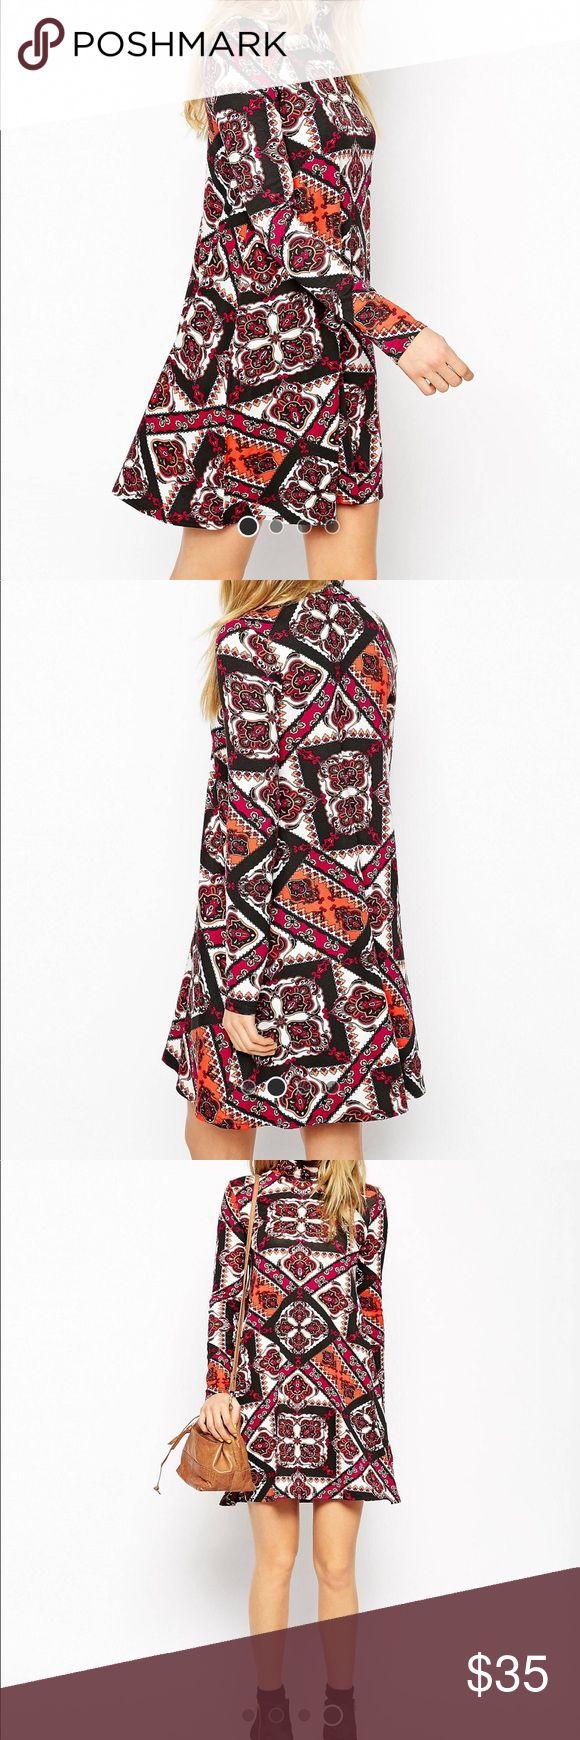 NWT ASOS long sleeved paisley dress NWT ASOS long sleeved paisley dress. Size 0. Purchased from Asos last fall and never wore.   🚫trades 🚫modeling ASOS Dresses Mini